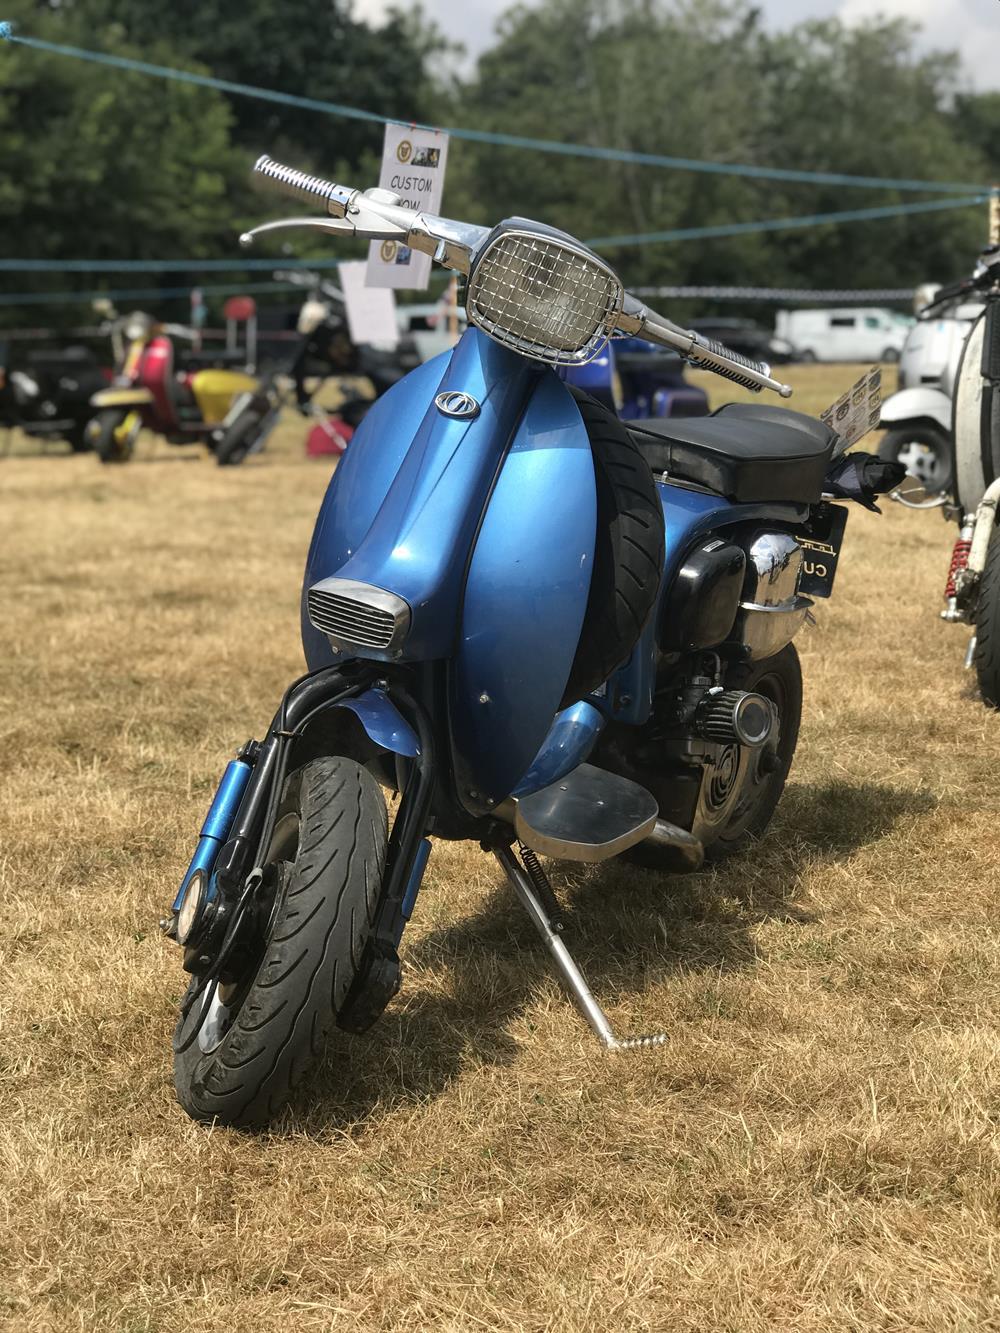 Blue Lambretta cutdown